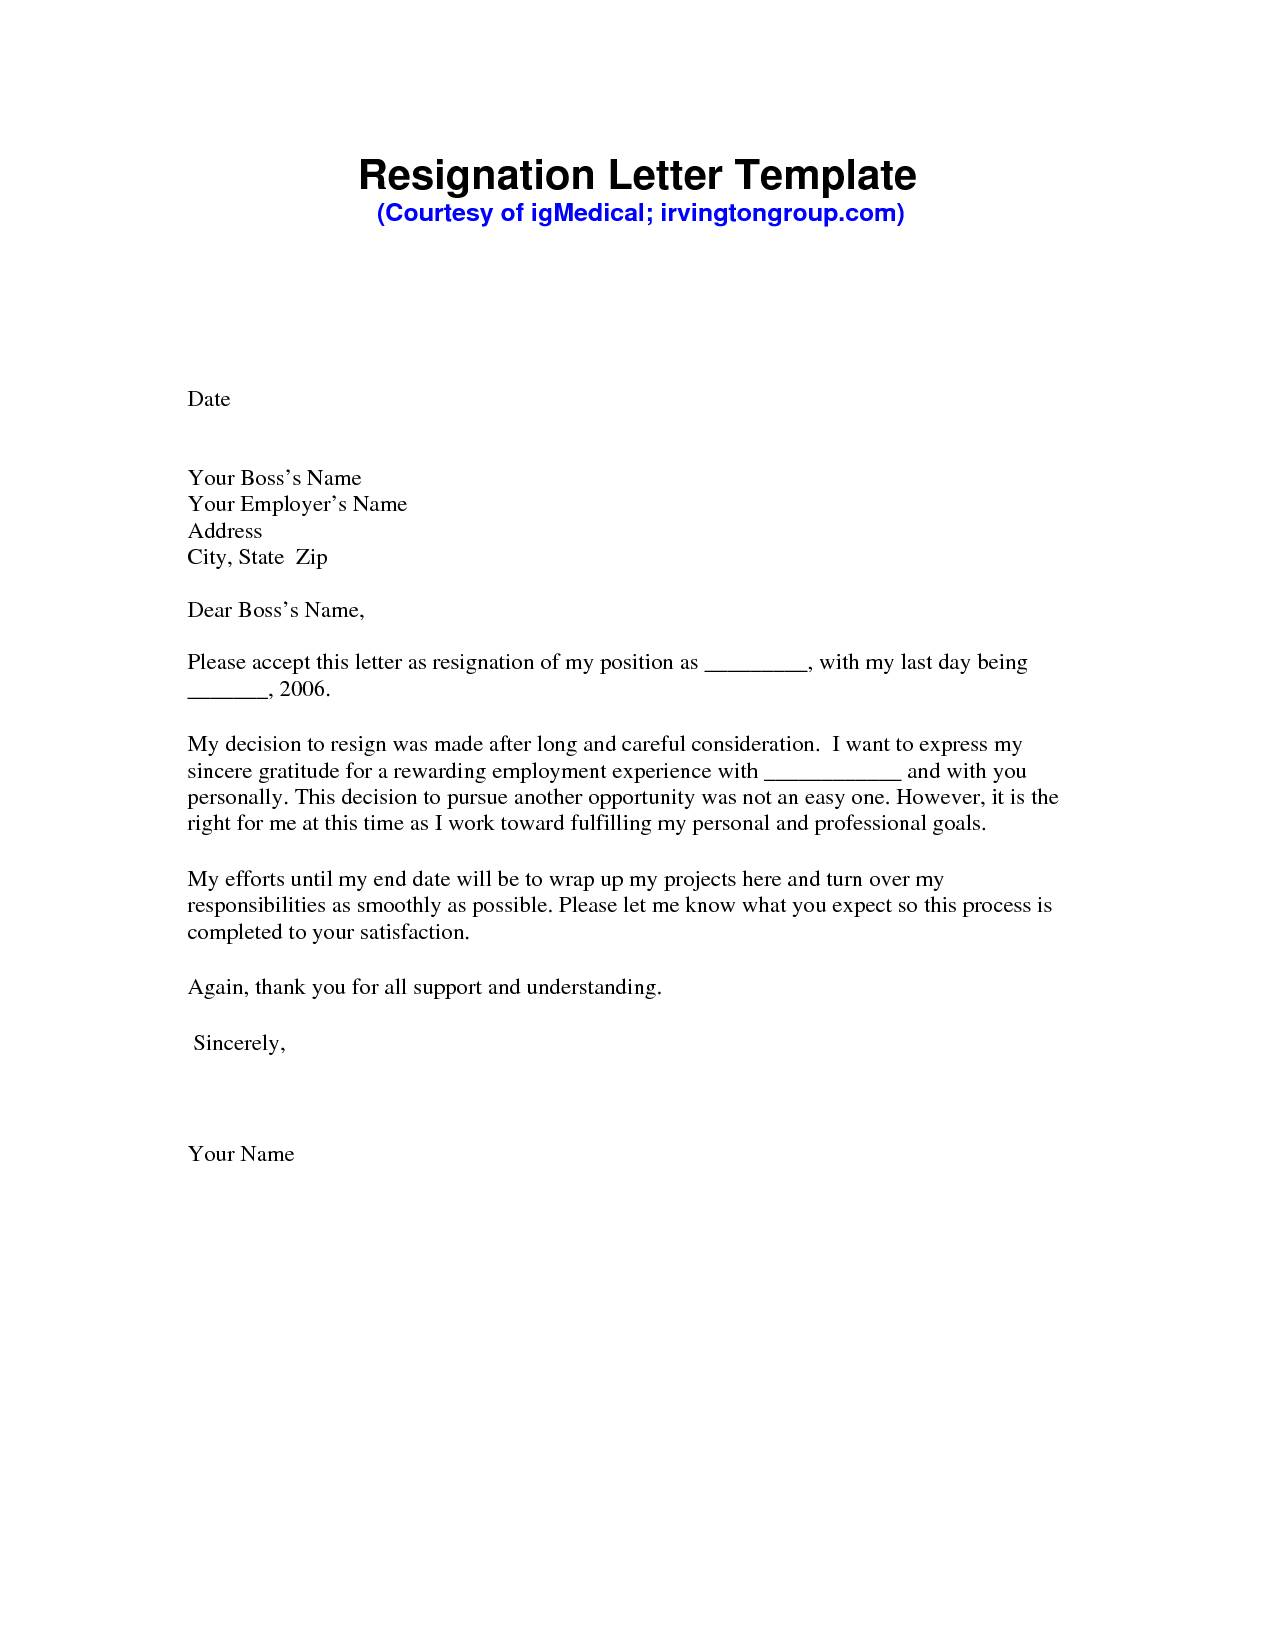 Resignation Letter Templates Pdf